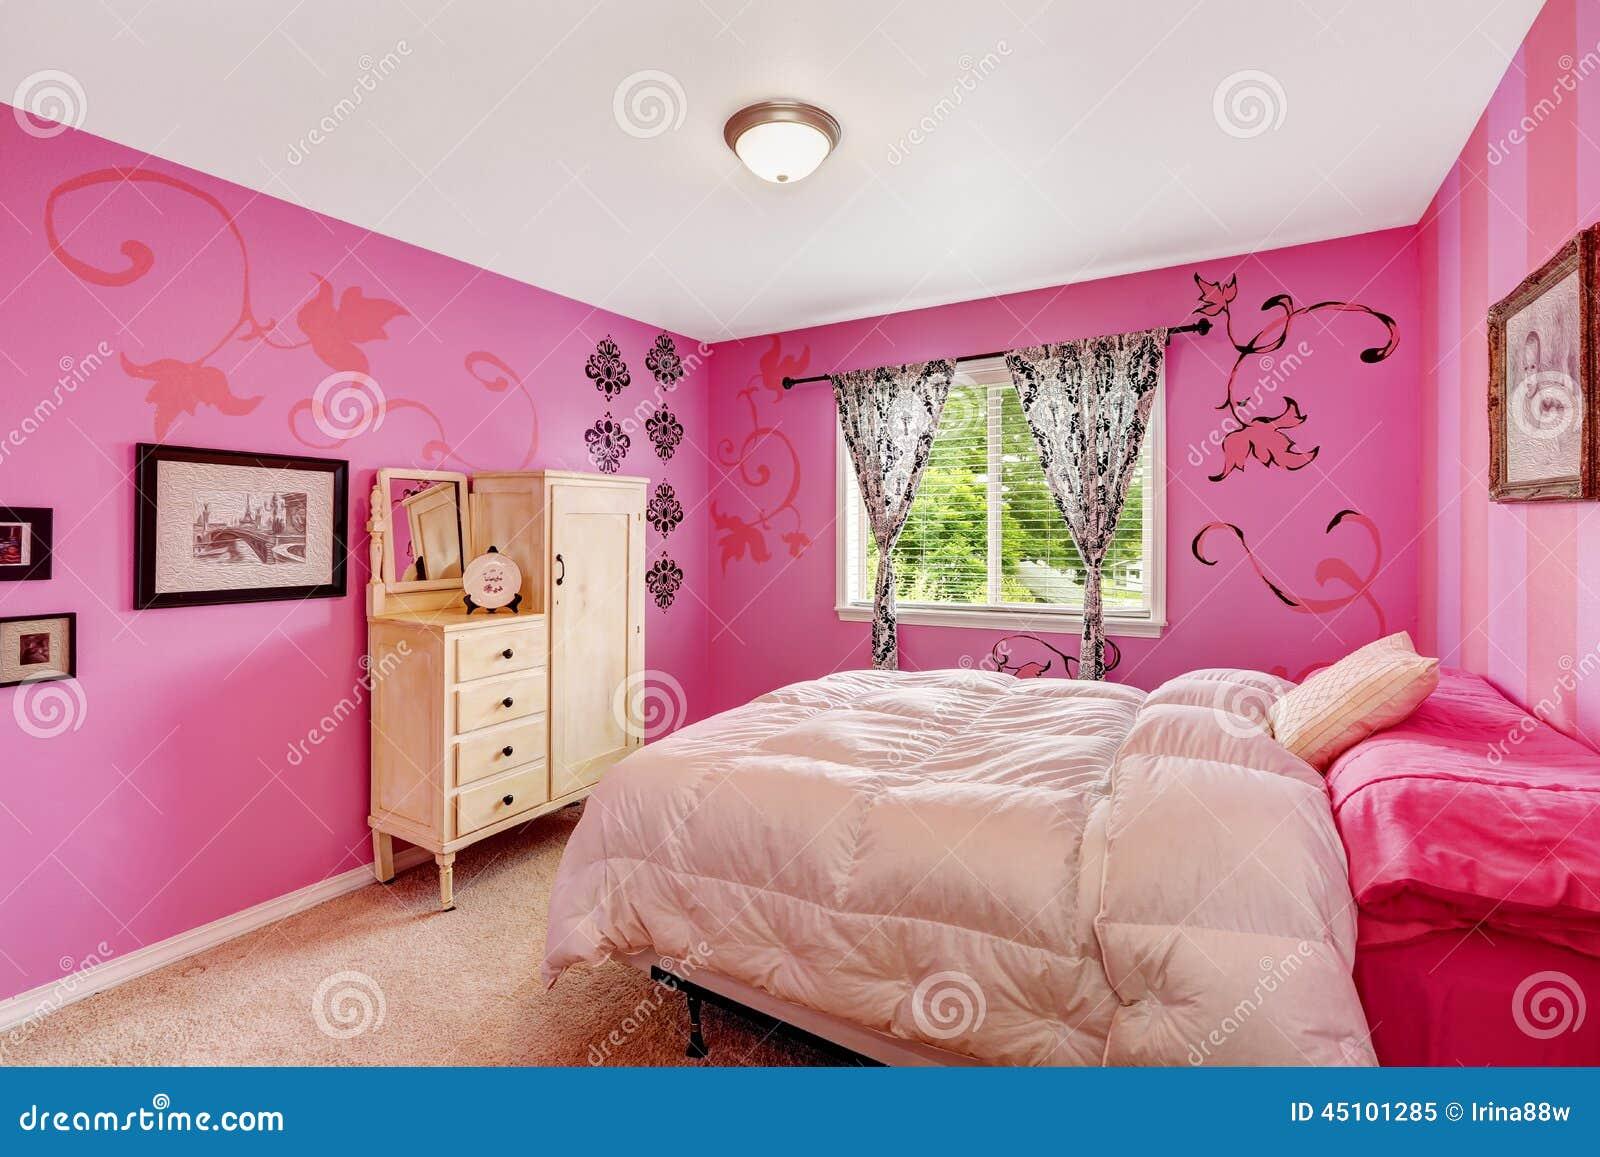 Het binnenland van de meisjesslaapkamer in heldere roze kleur stock foto beeld 45101285 - Roze meid slaapkamer ...